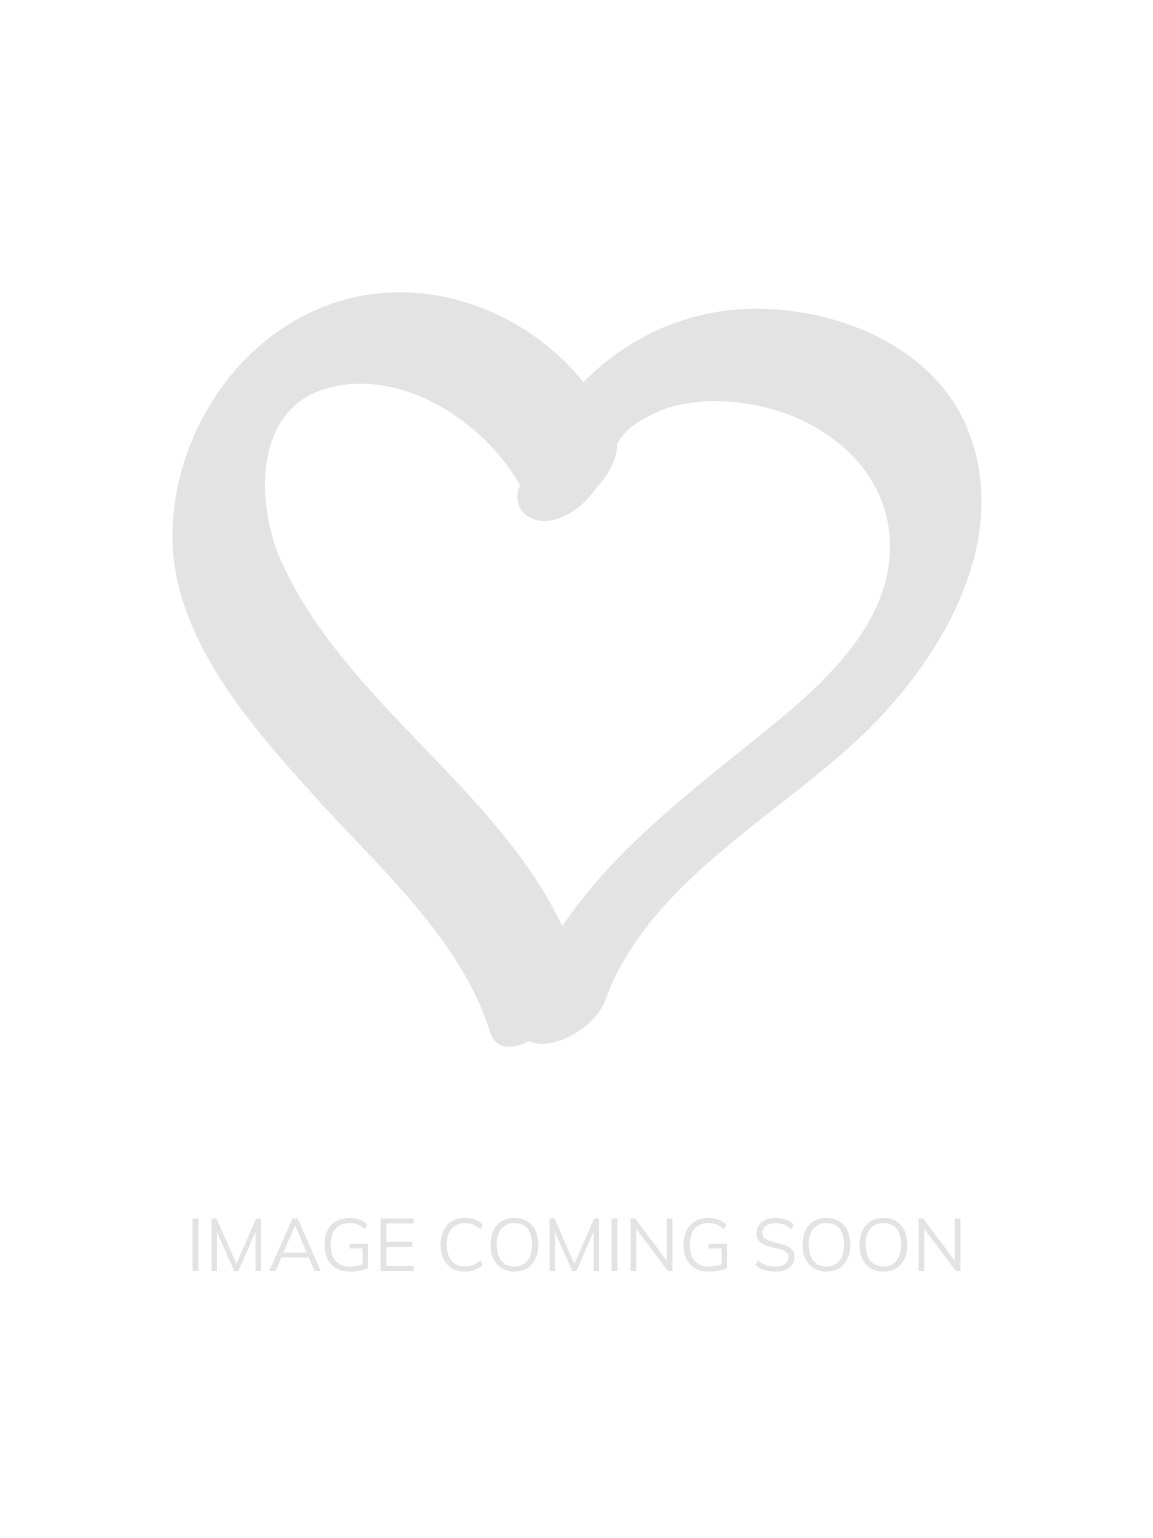 9d65e1907ff4c Avero Round Shaped Bra - Scarlet